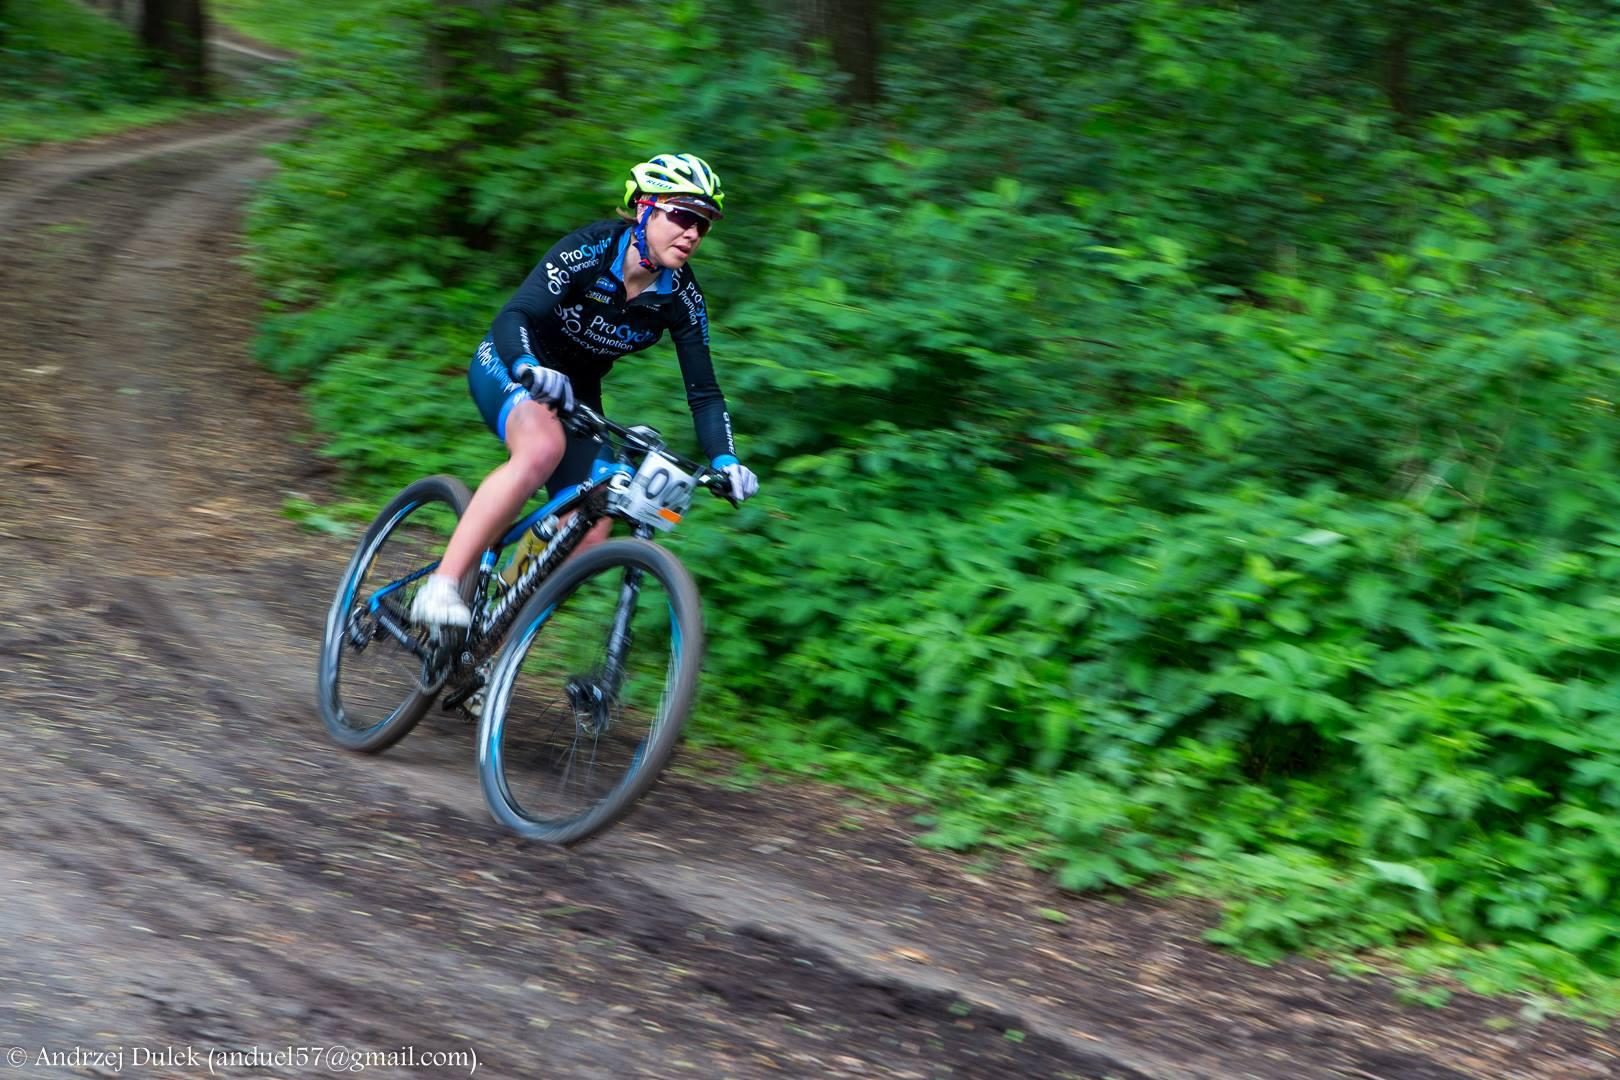 Katarzyna Łysek (Procycling.pl) – XCM Miłosna, Kwidzyn